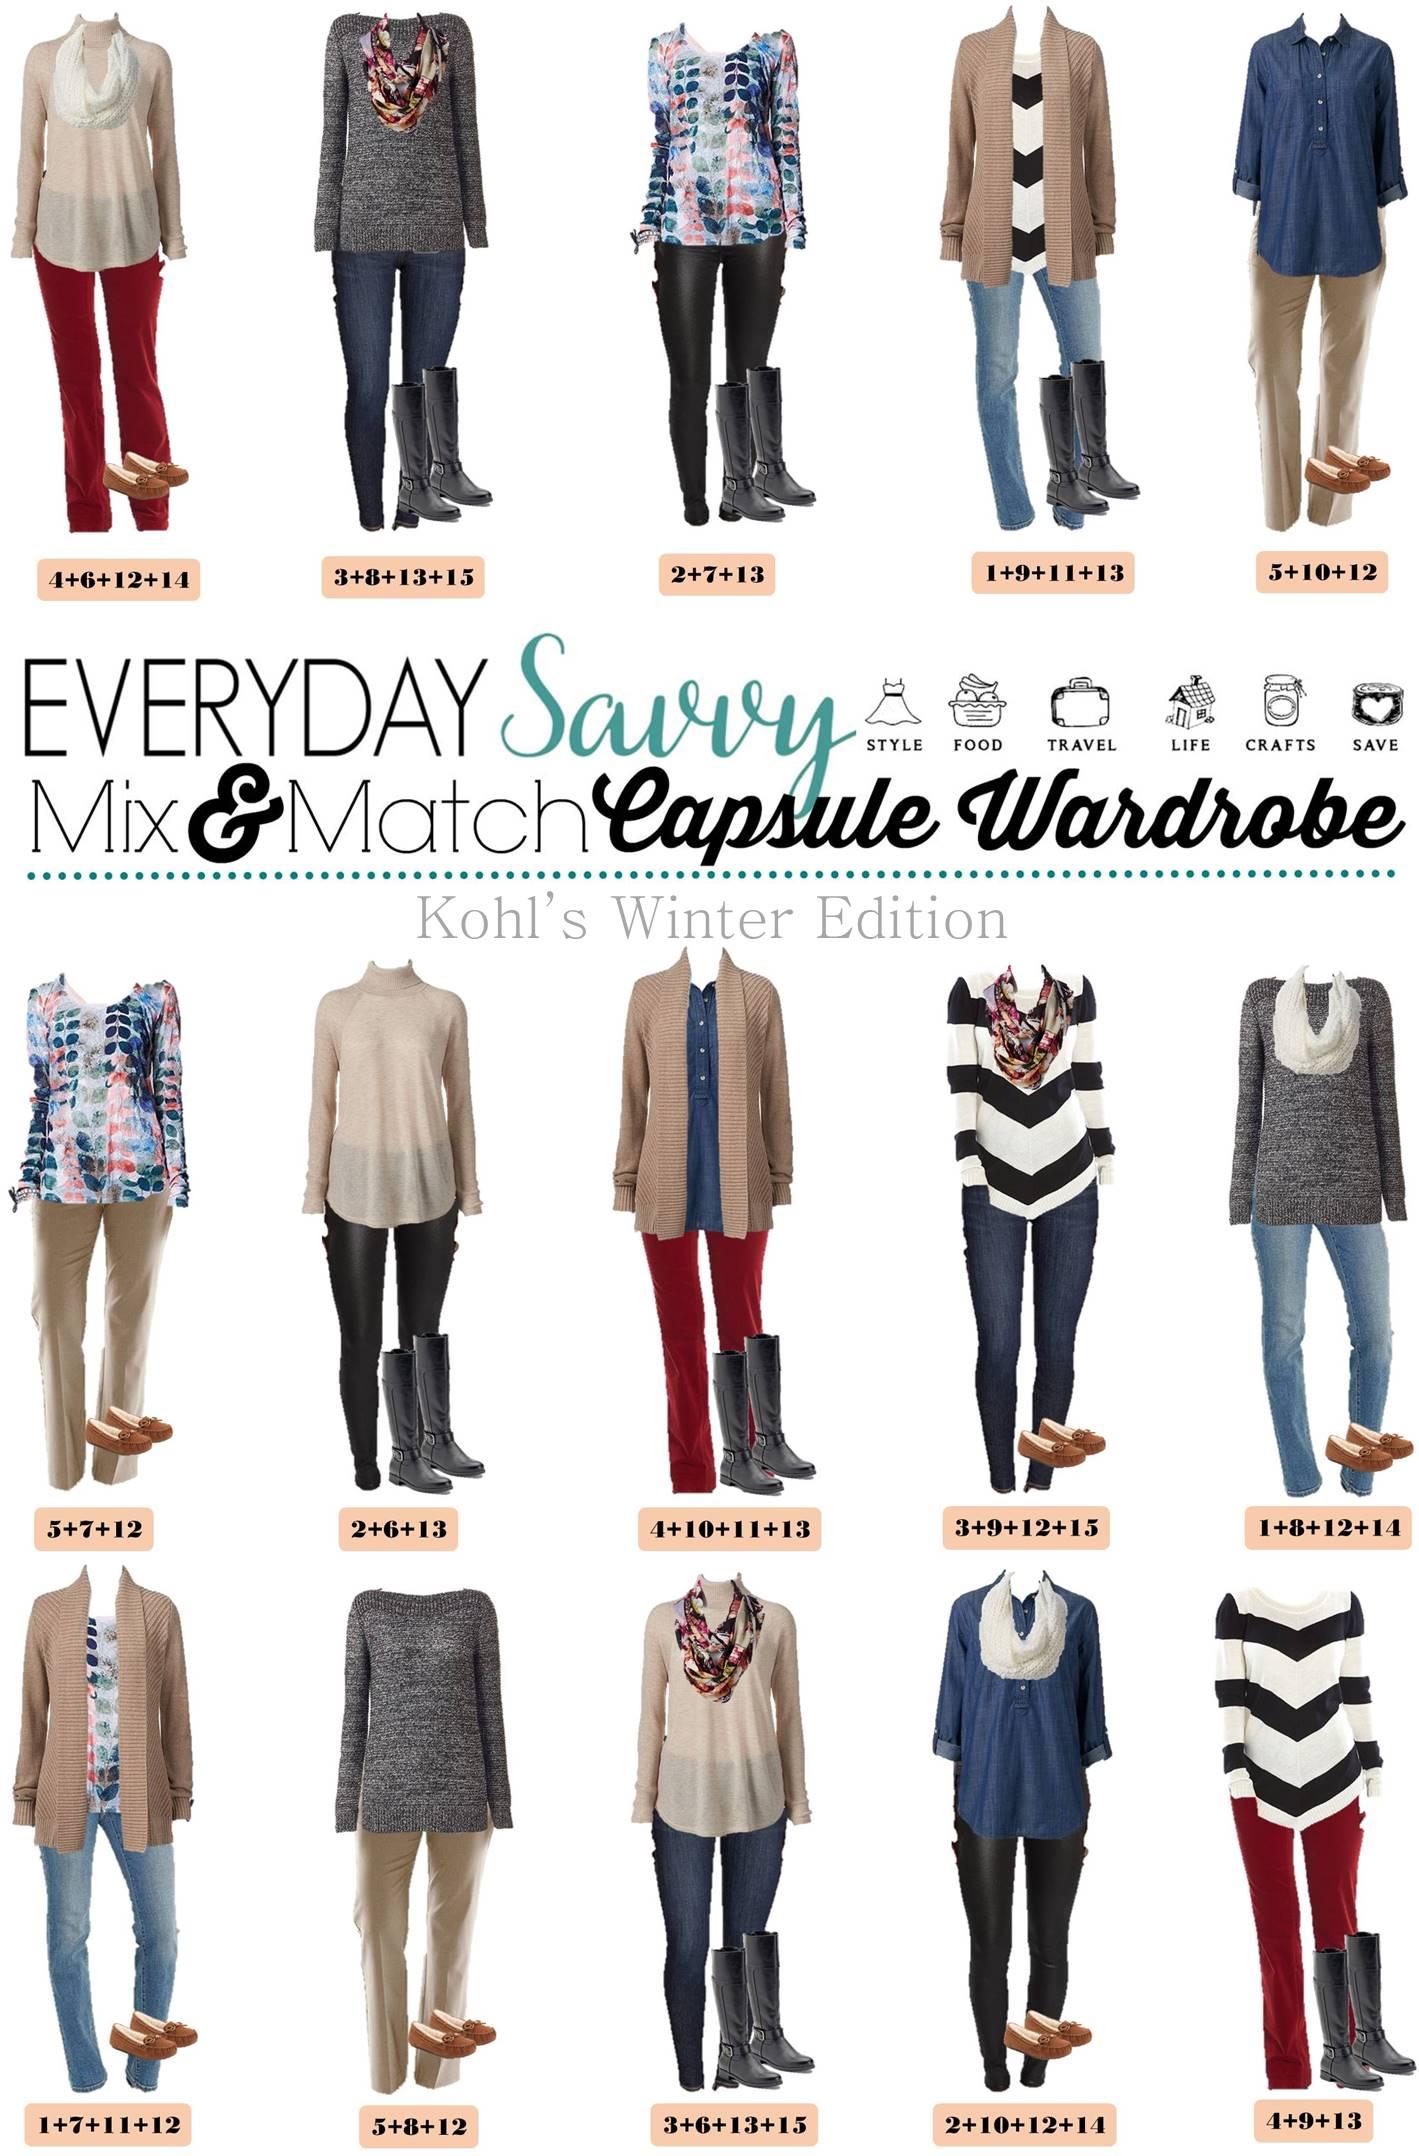 Mix And Match Kohls Winter Capsule Wardrobe